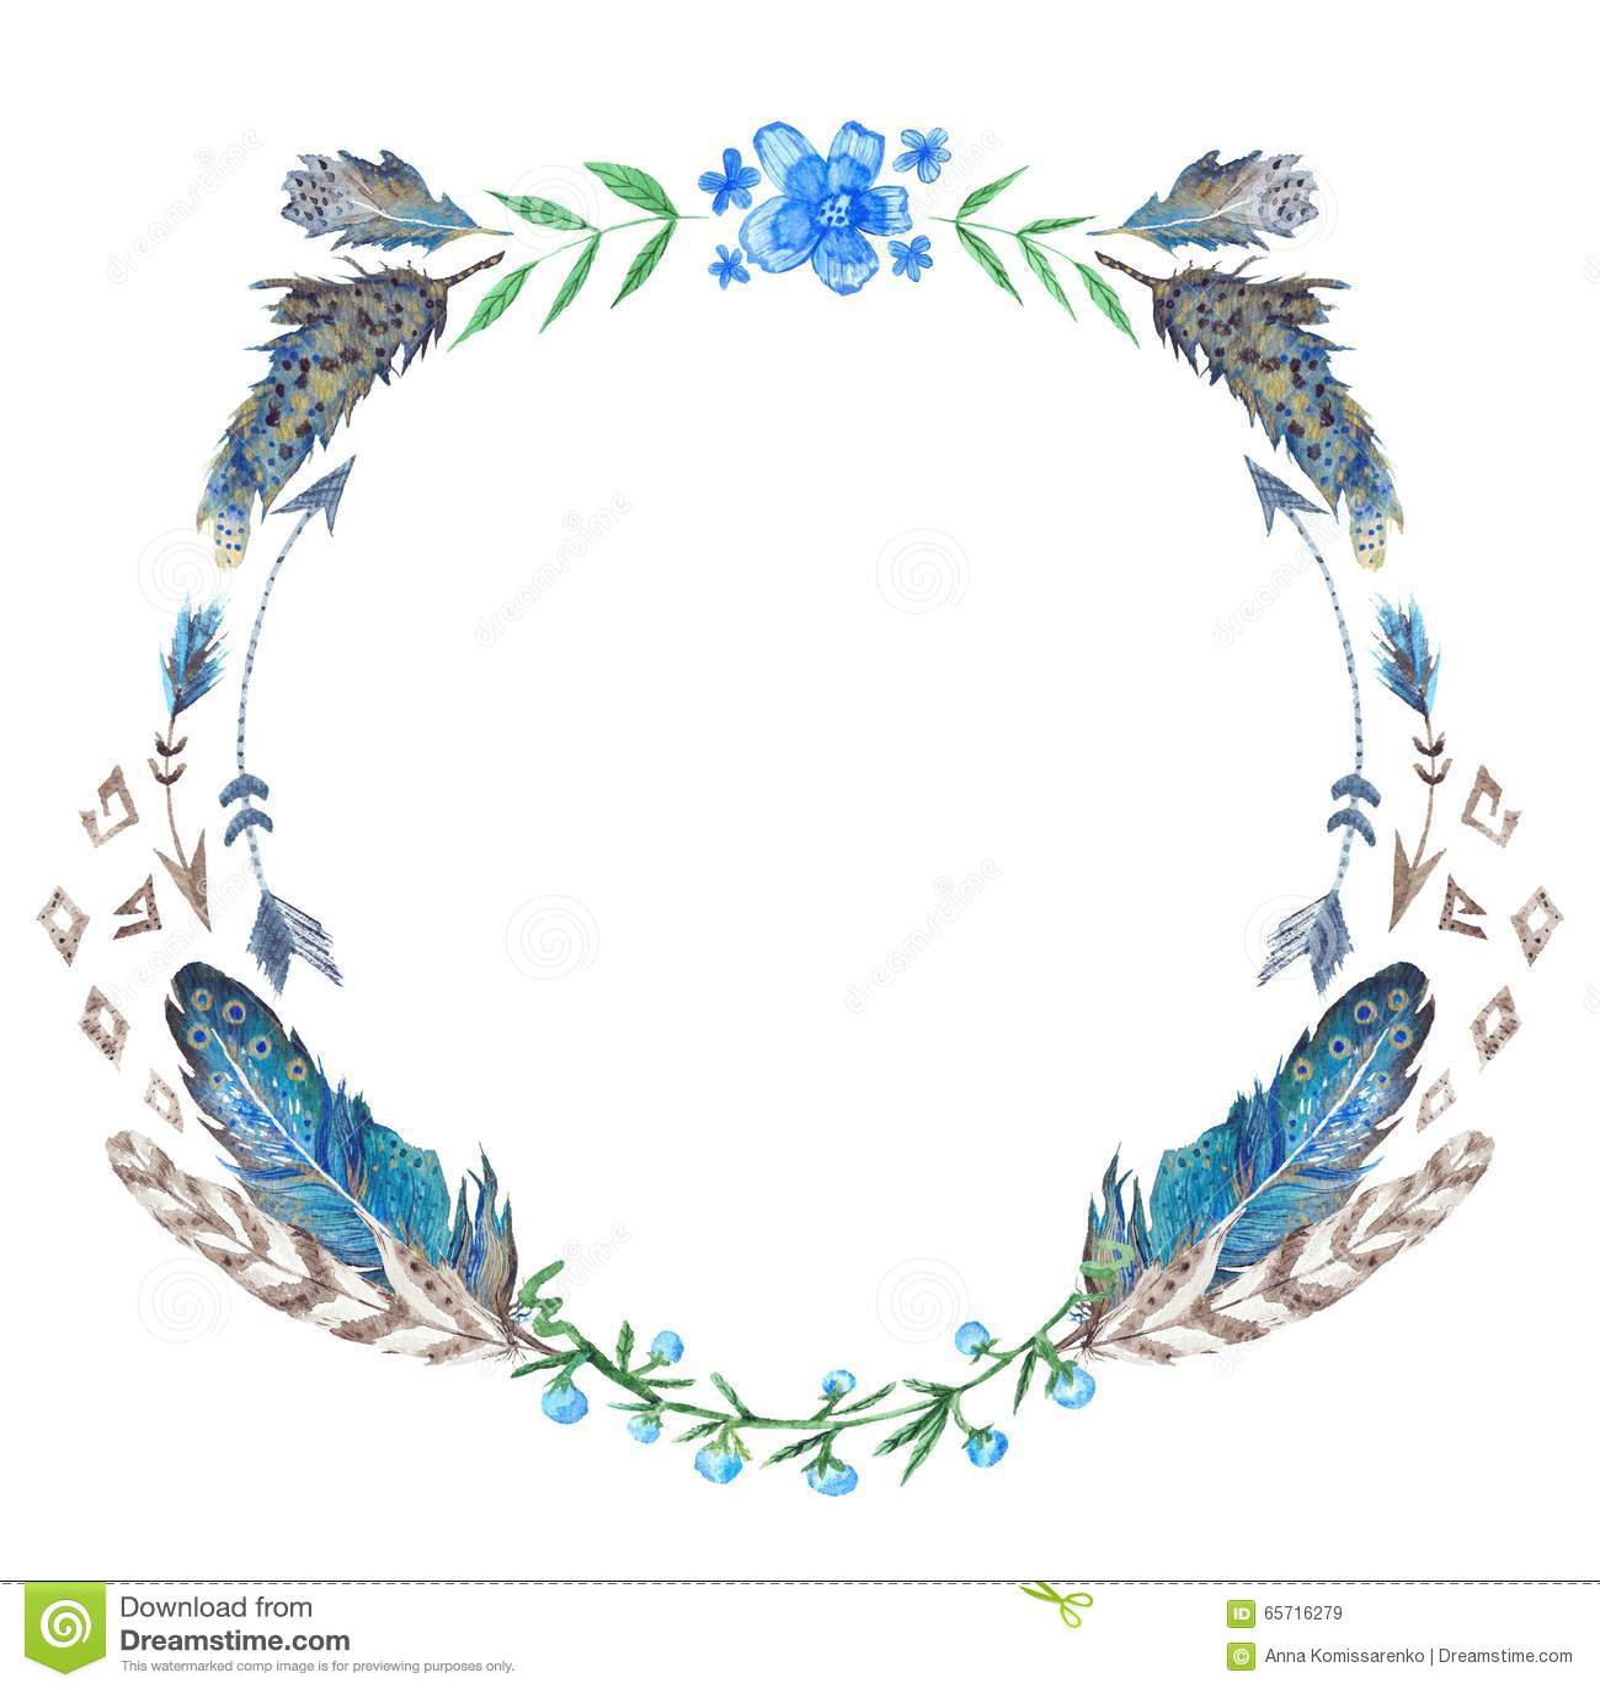 Watercolor Boho Wreath Stock Photo - Image: 65716279